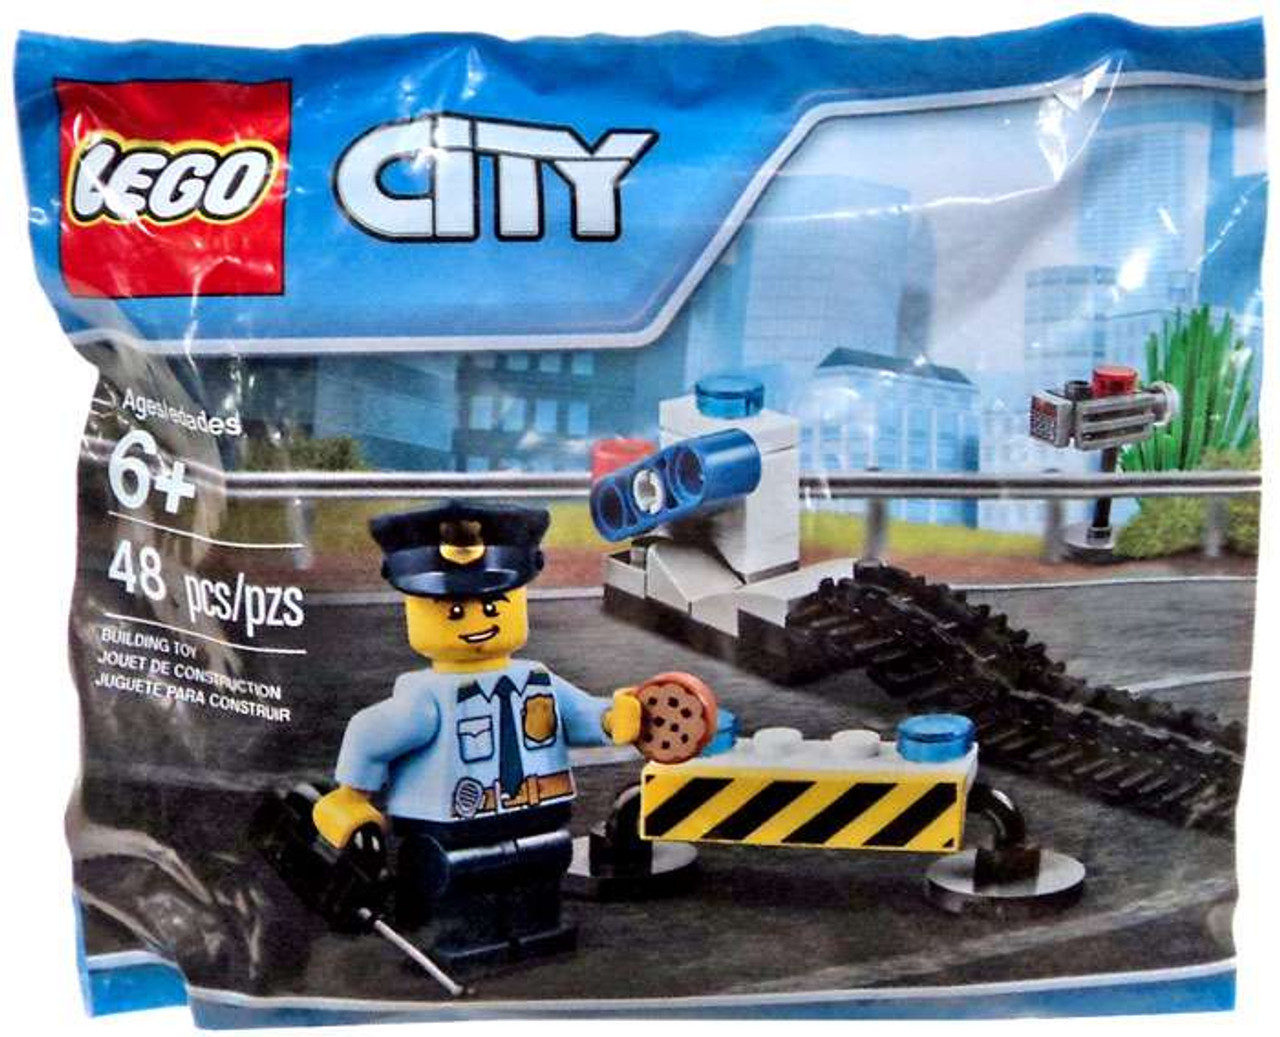 lego city police road block mini set 6182882 bagged - Lgo City Police